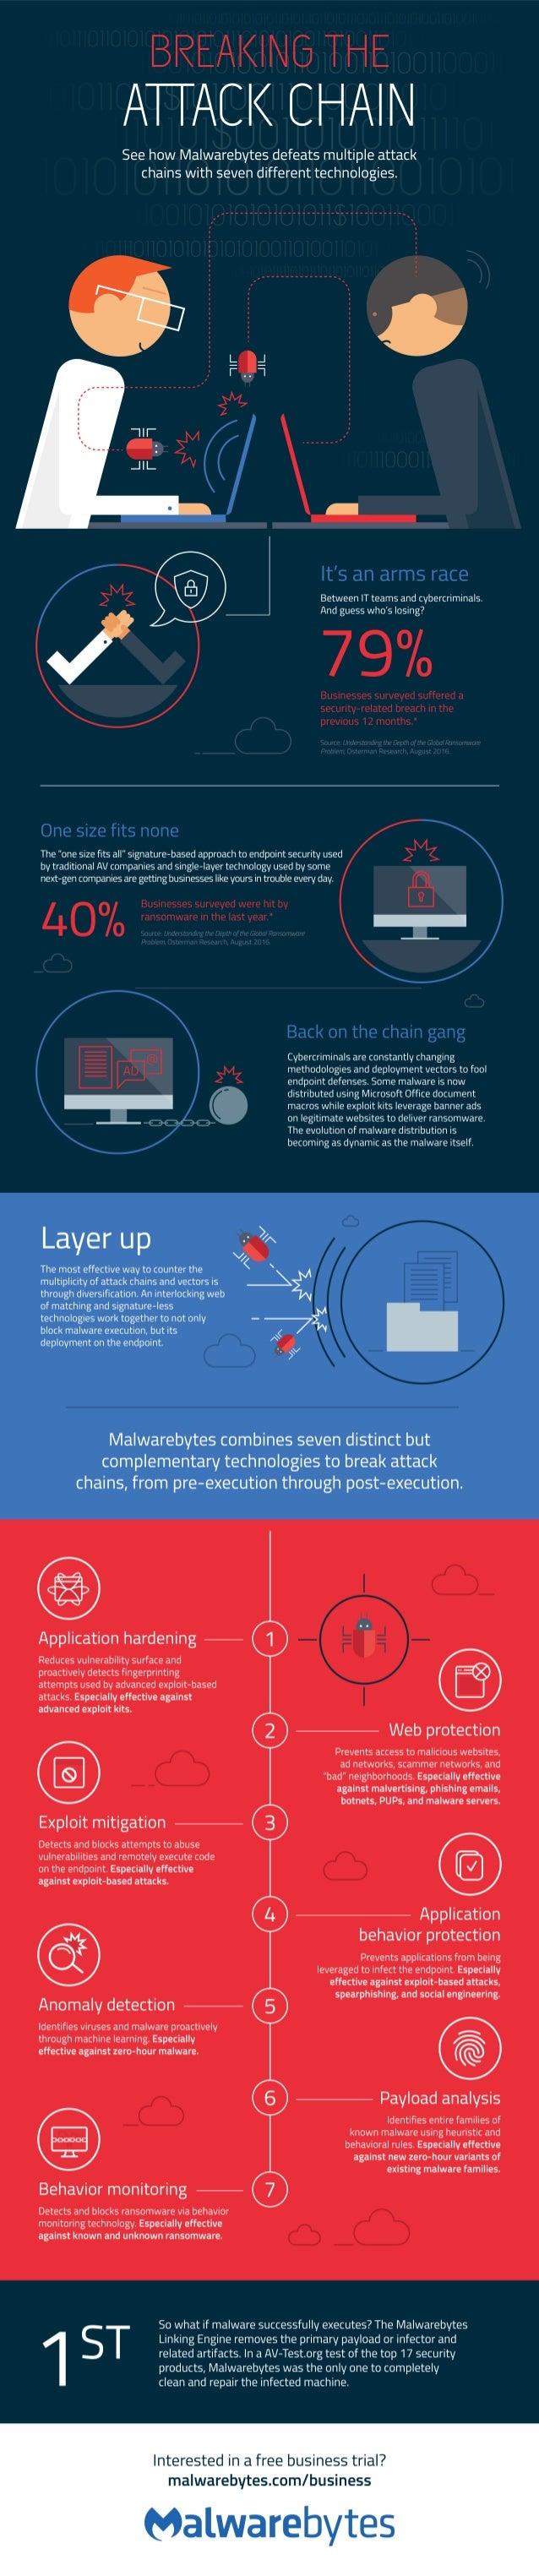 Malwarebytes - Breaking the Attack Chain